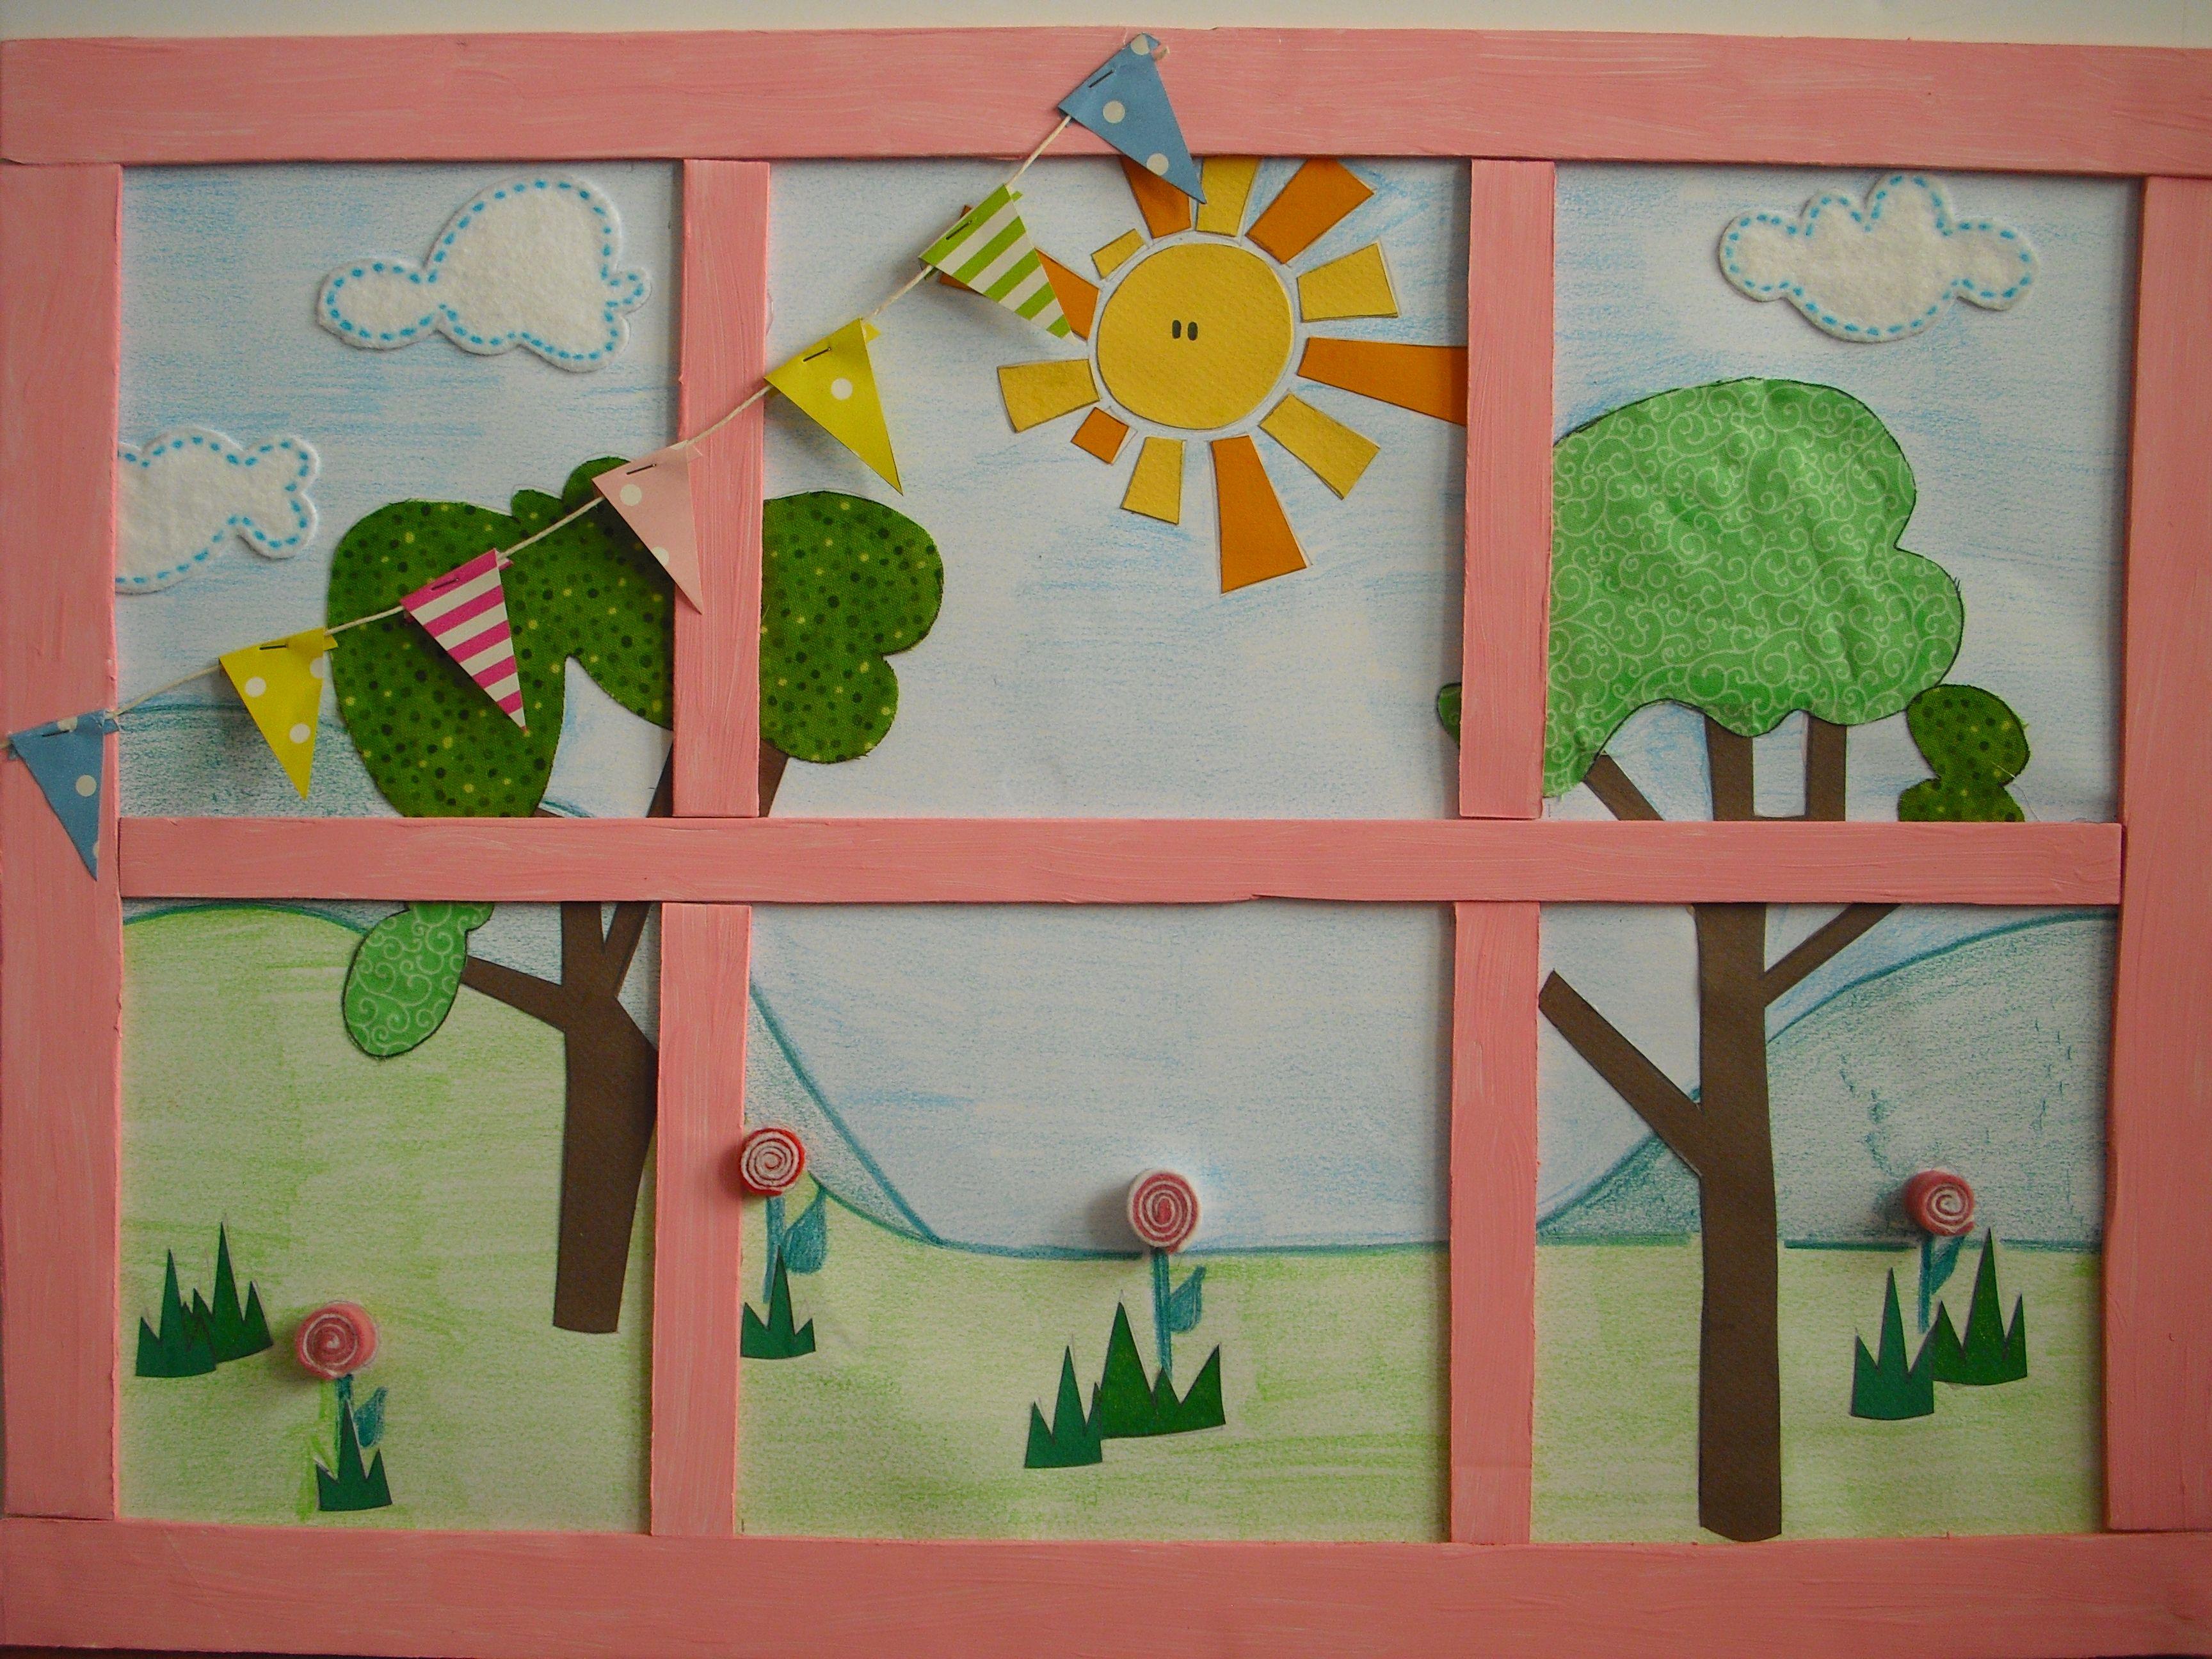 A window on LalaloopsyLand...backdrop per il Lalaparty di Emma